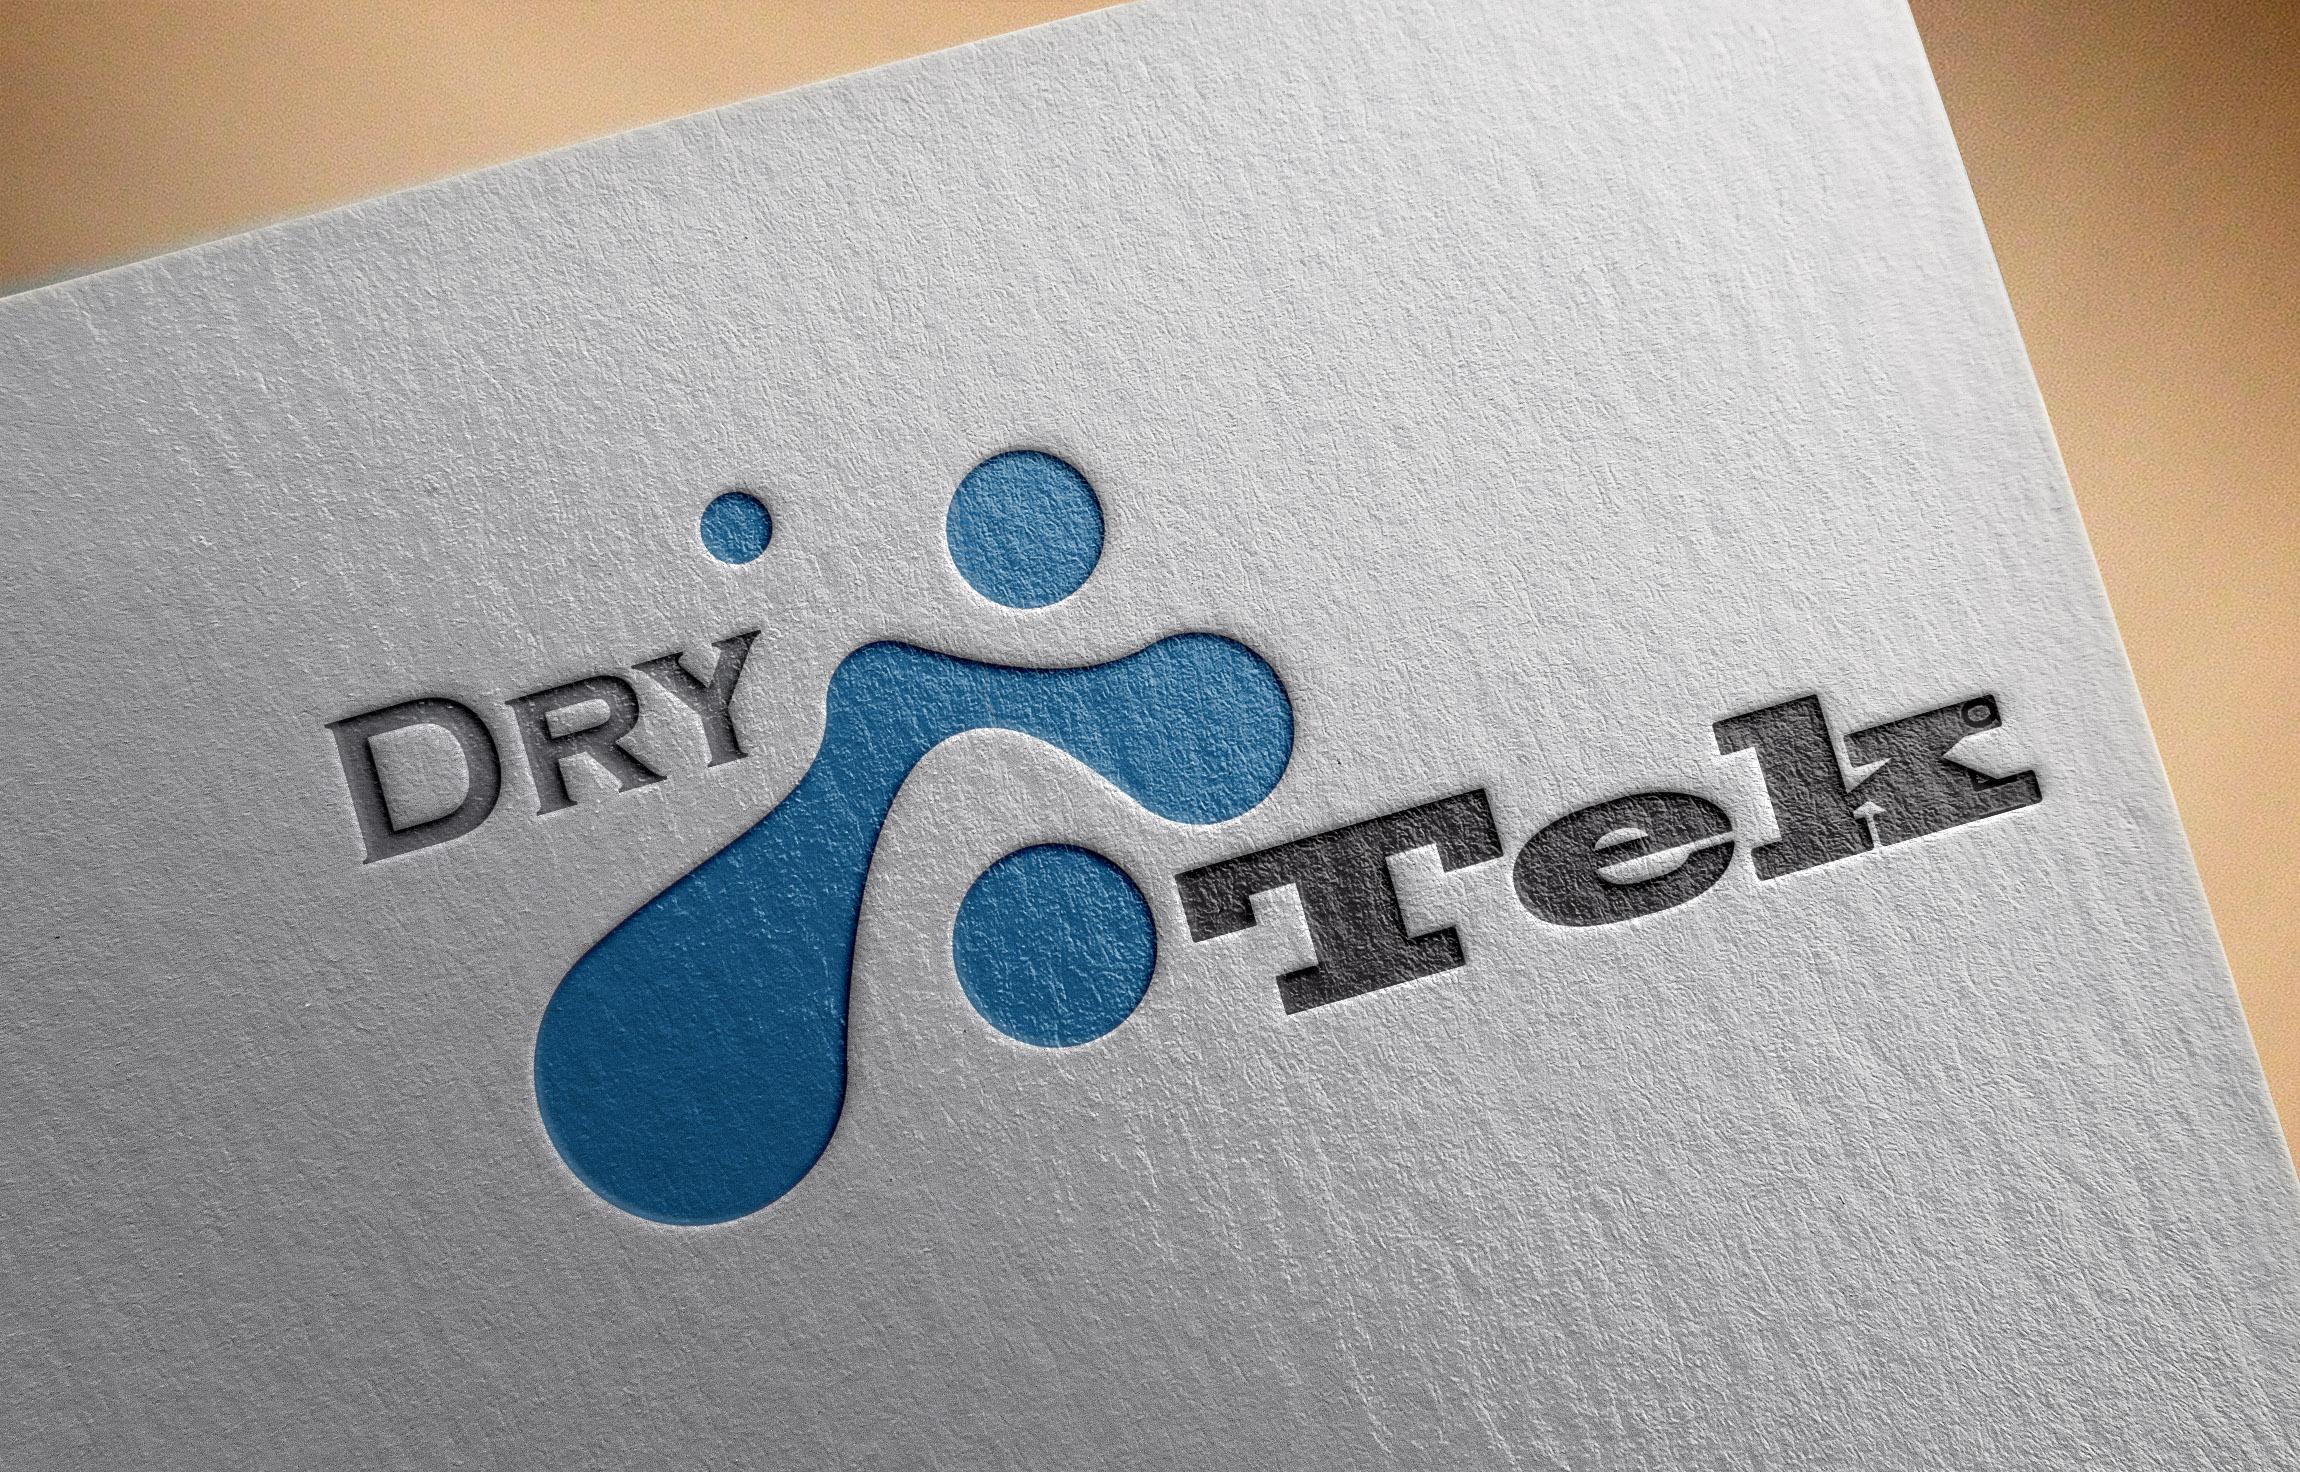 Создание логотипа для компании Drytek фото f_10659ba62cf13829.jpg